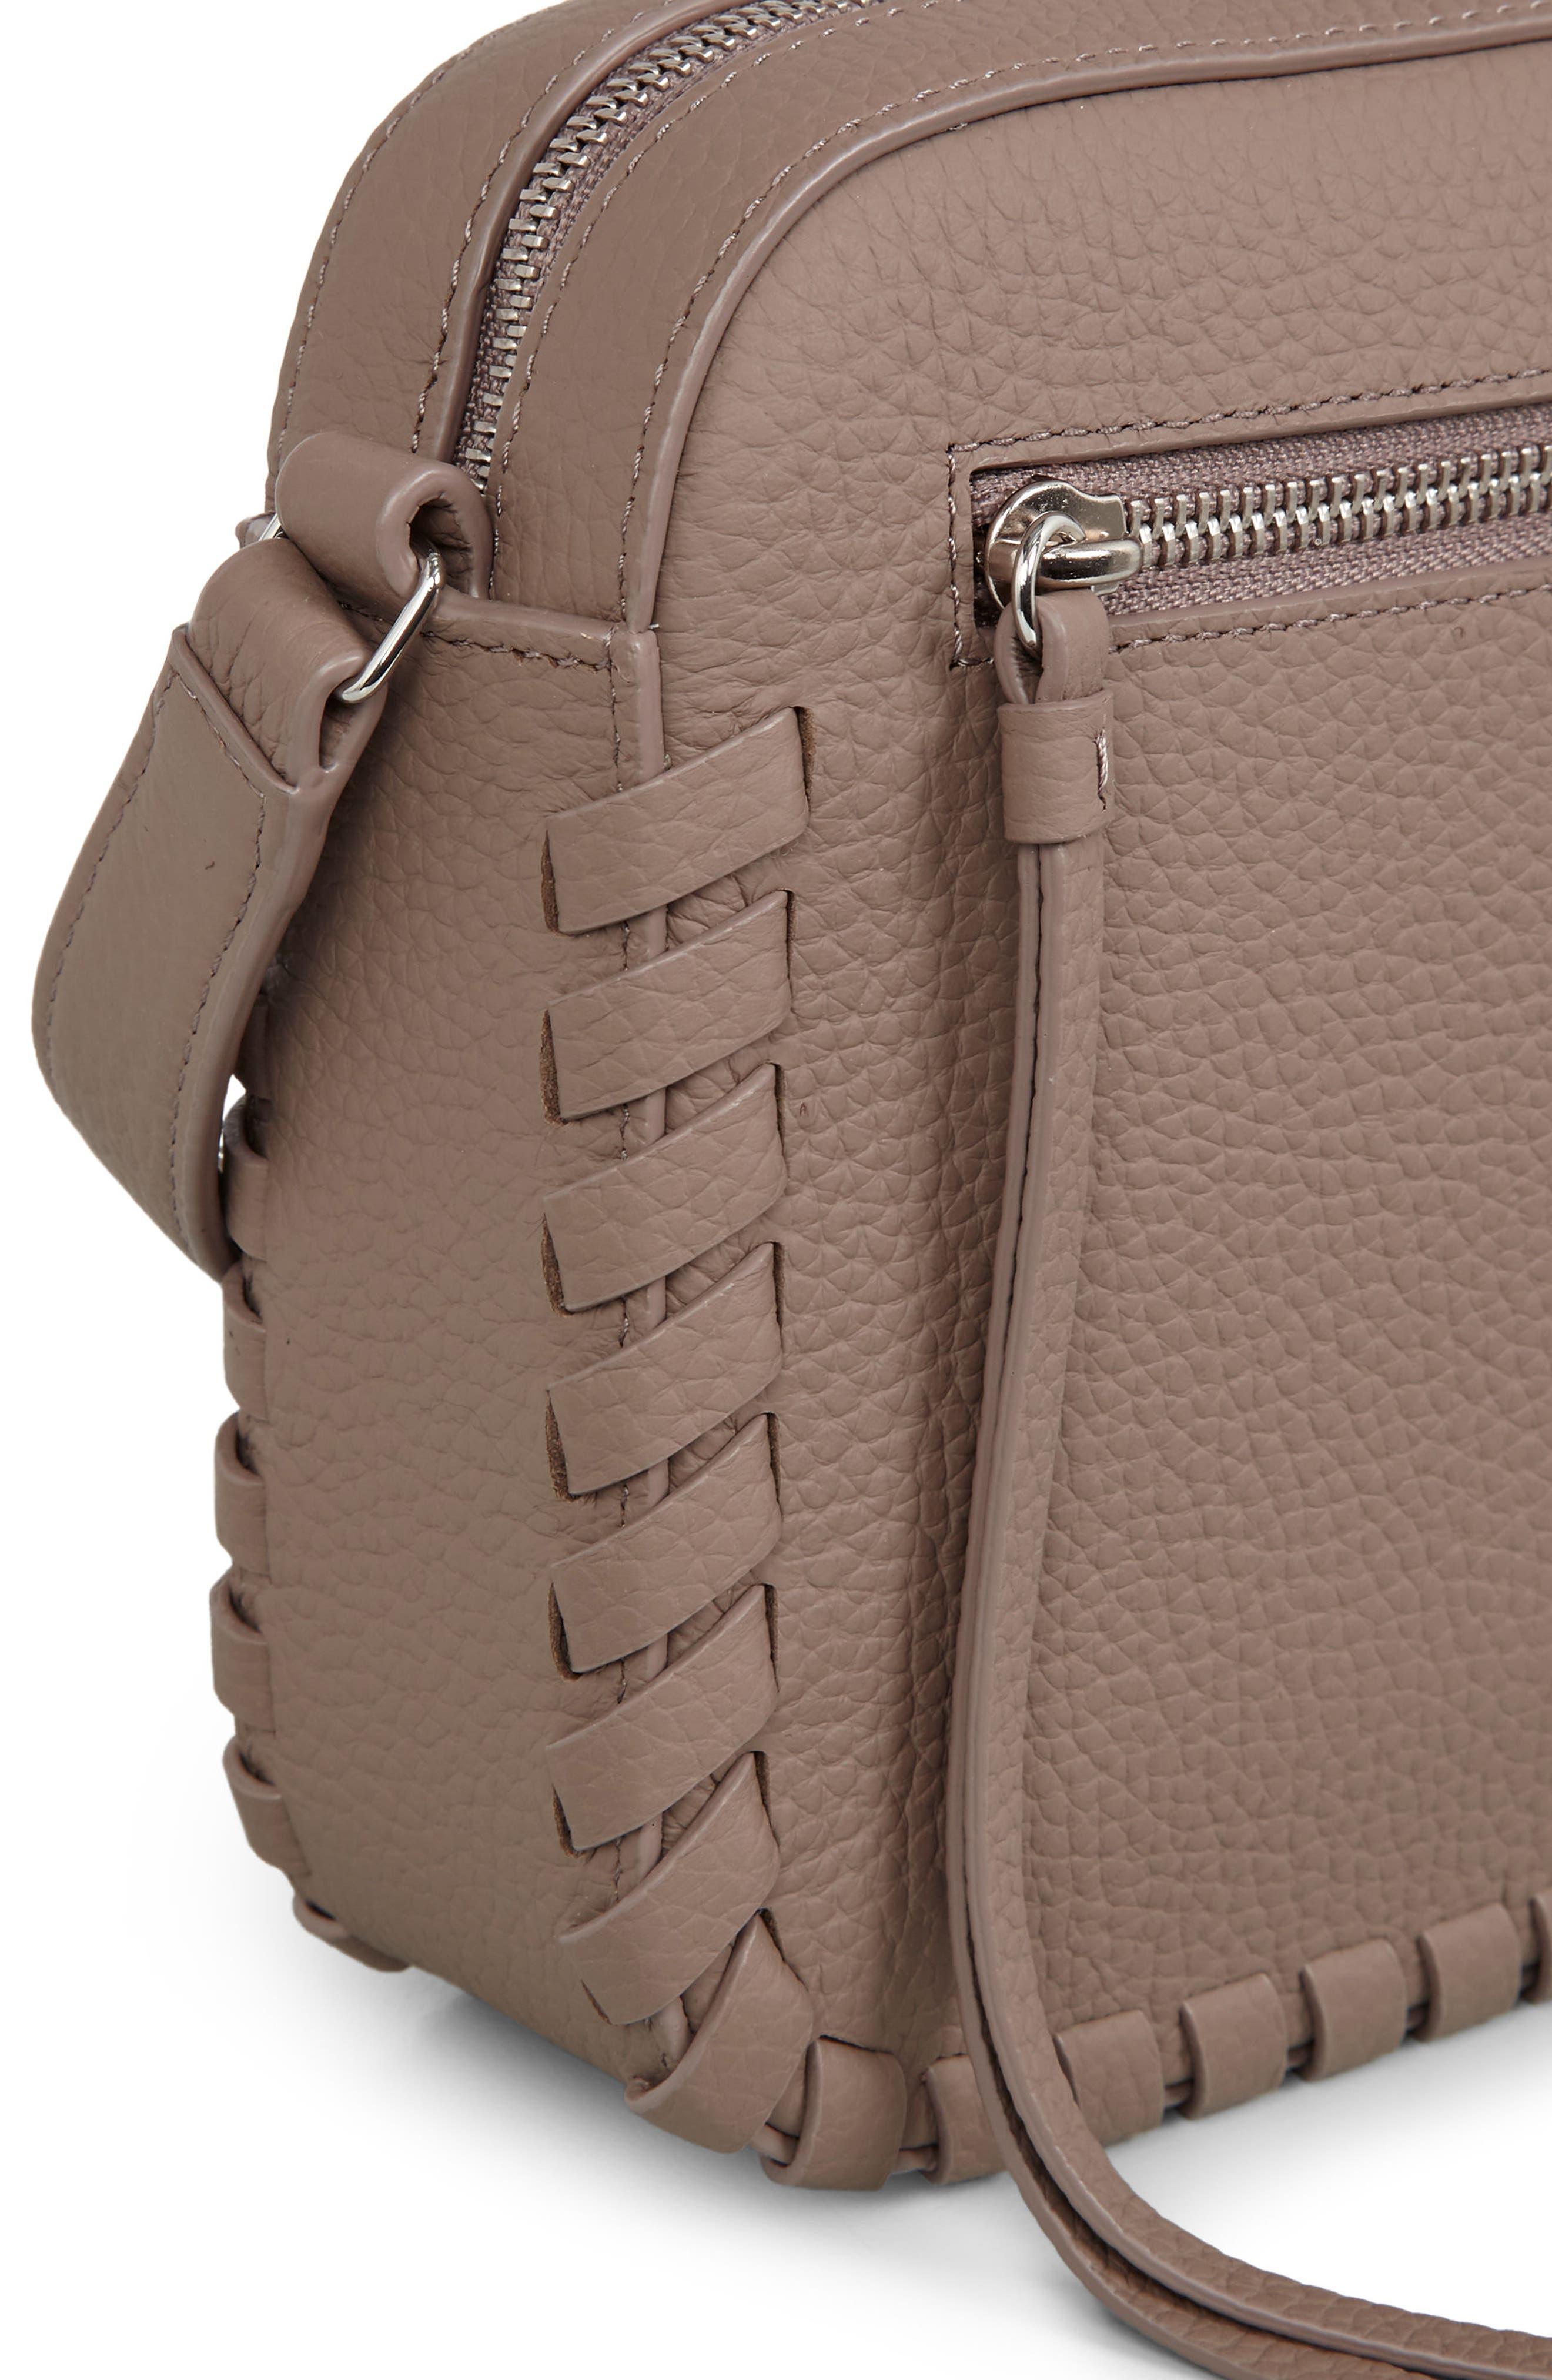 Kepi Mini Leather Crossbody Bag,                             Alternate thumbnail 7, color,                             ALMOND BROWN